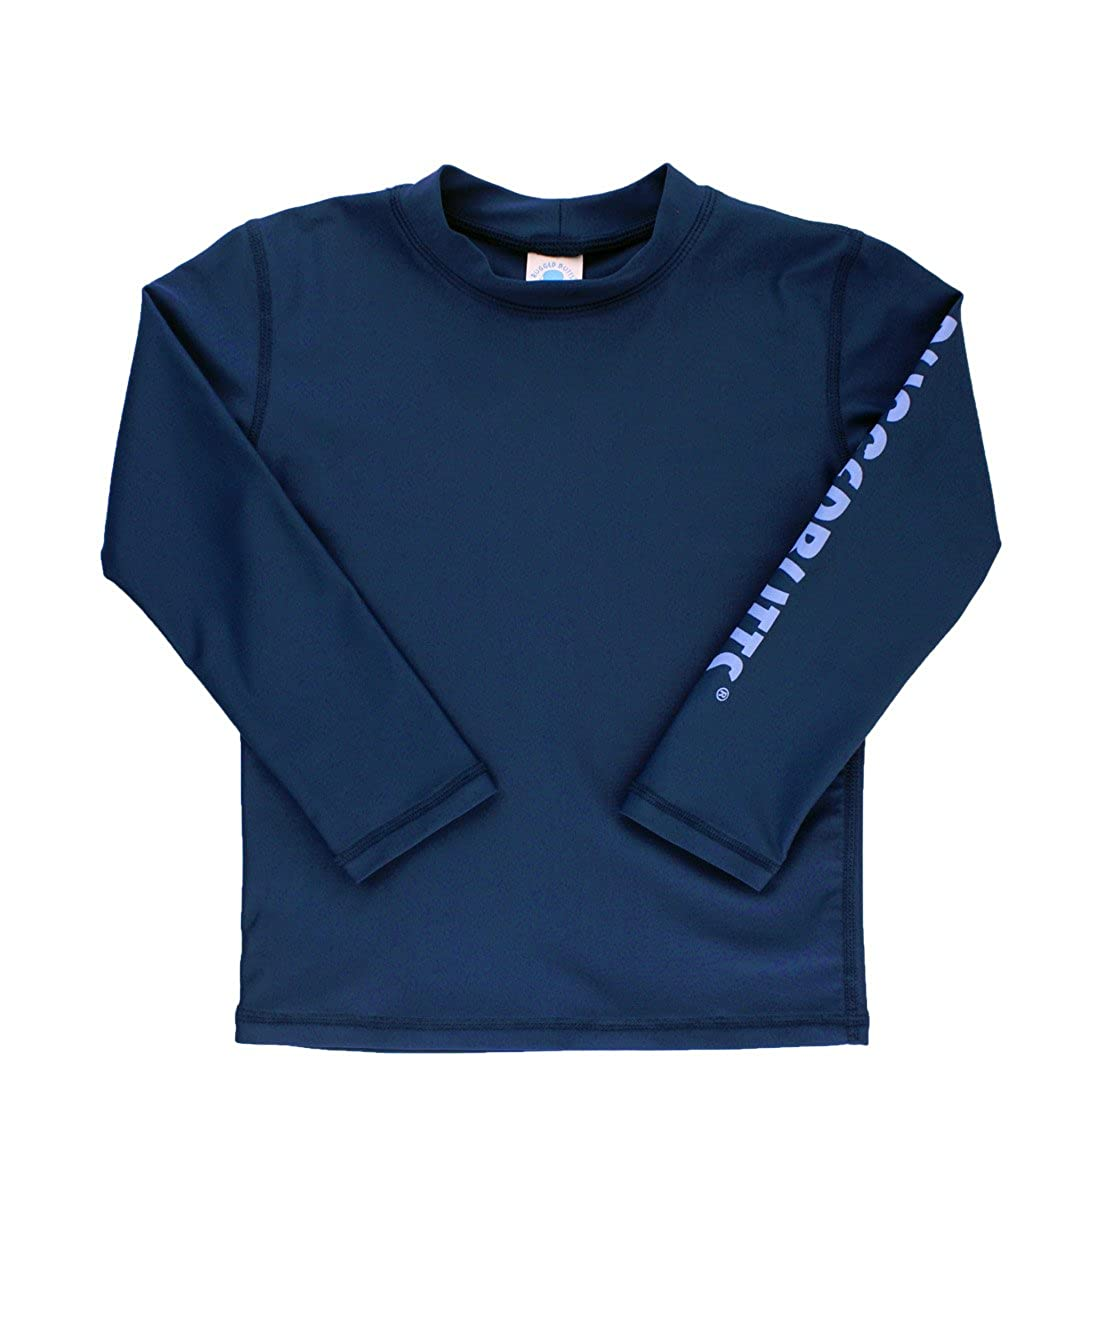 RuggedButts Little Boys Navy Long Sleeve UPF 50+ Sun Protective Rash Guard Surf Swim Shirt RGSNVXX-RBLG-TDLR